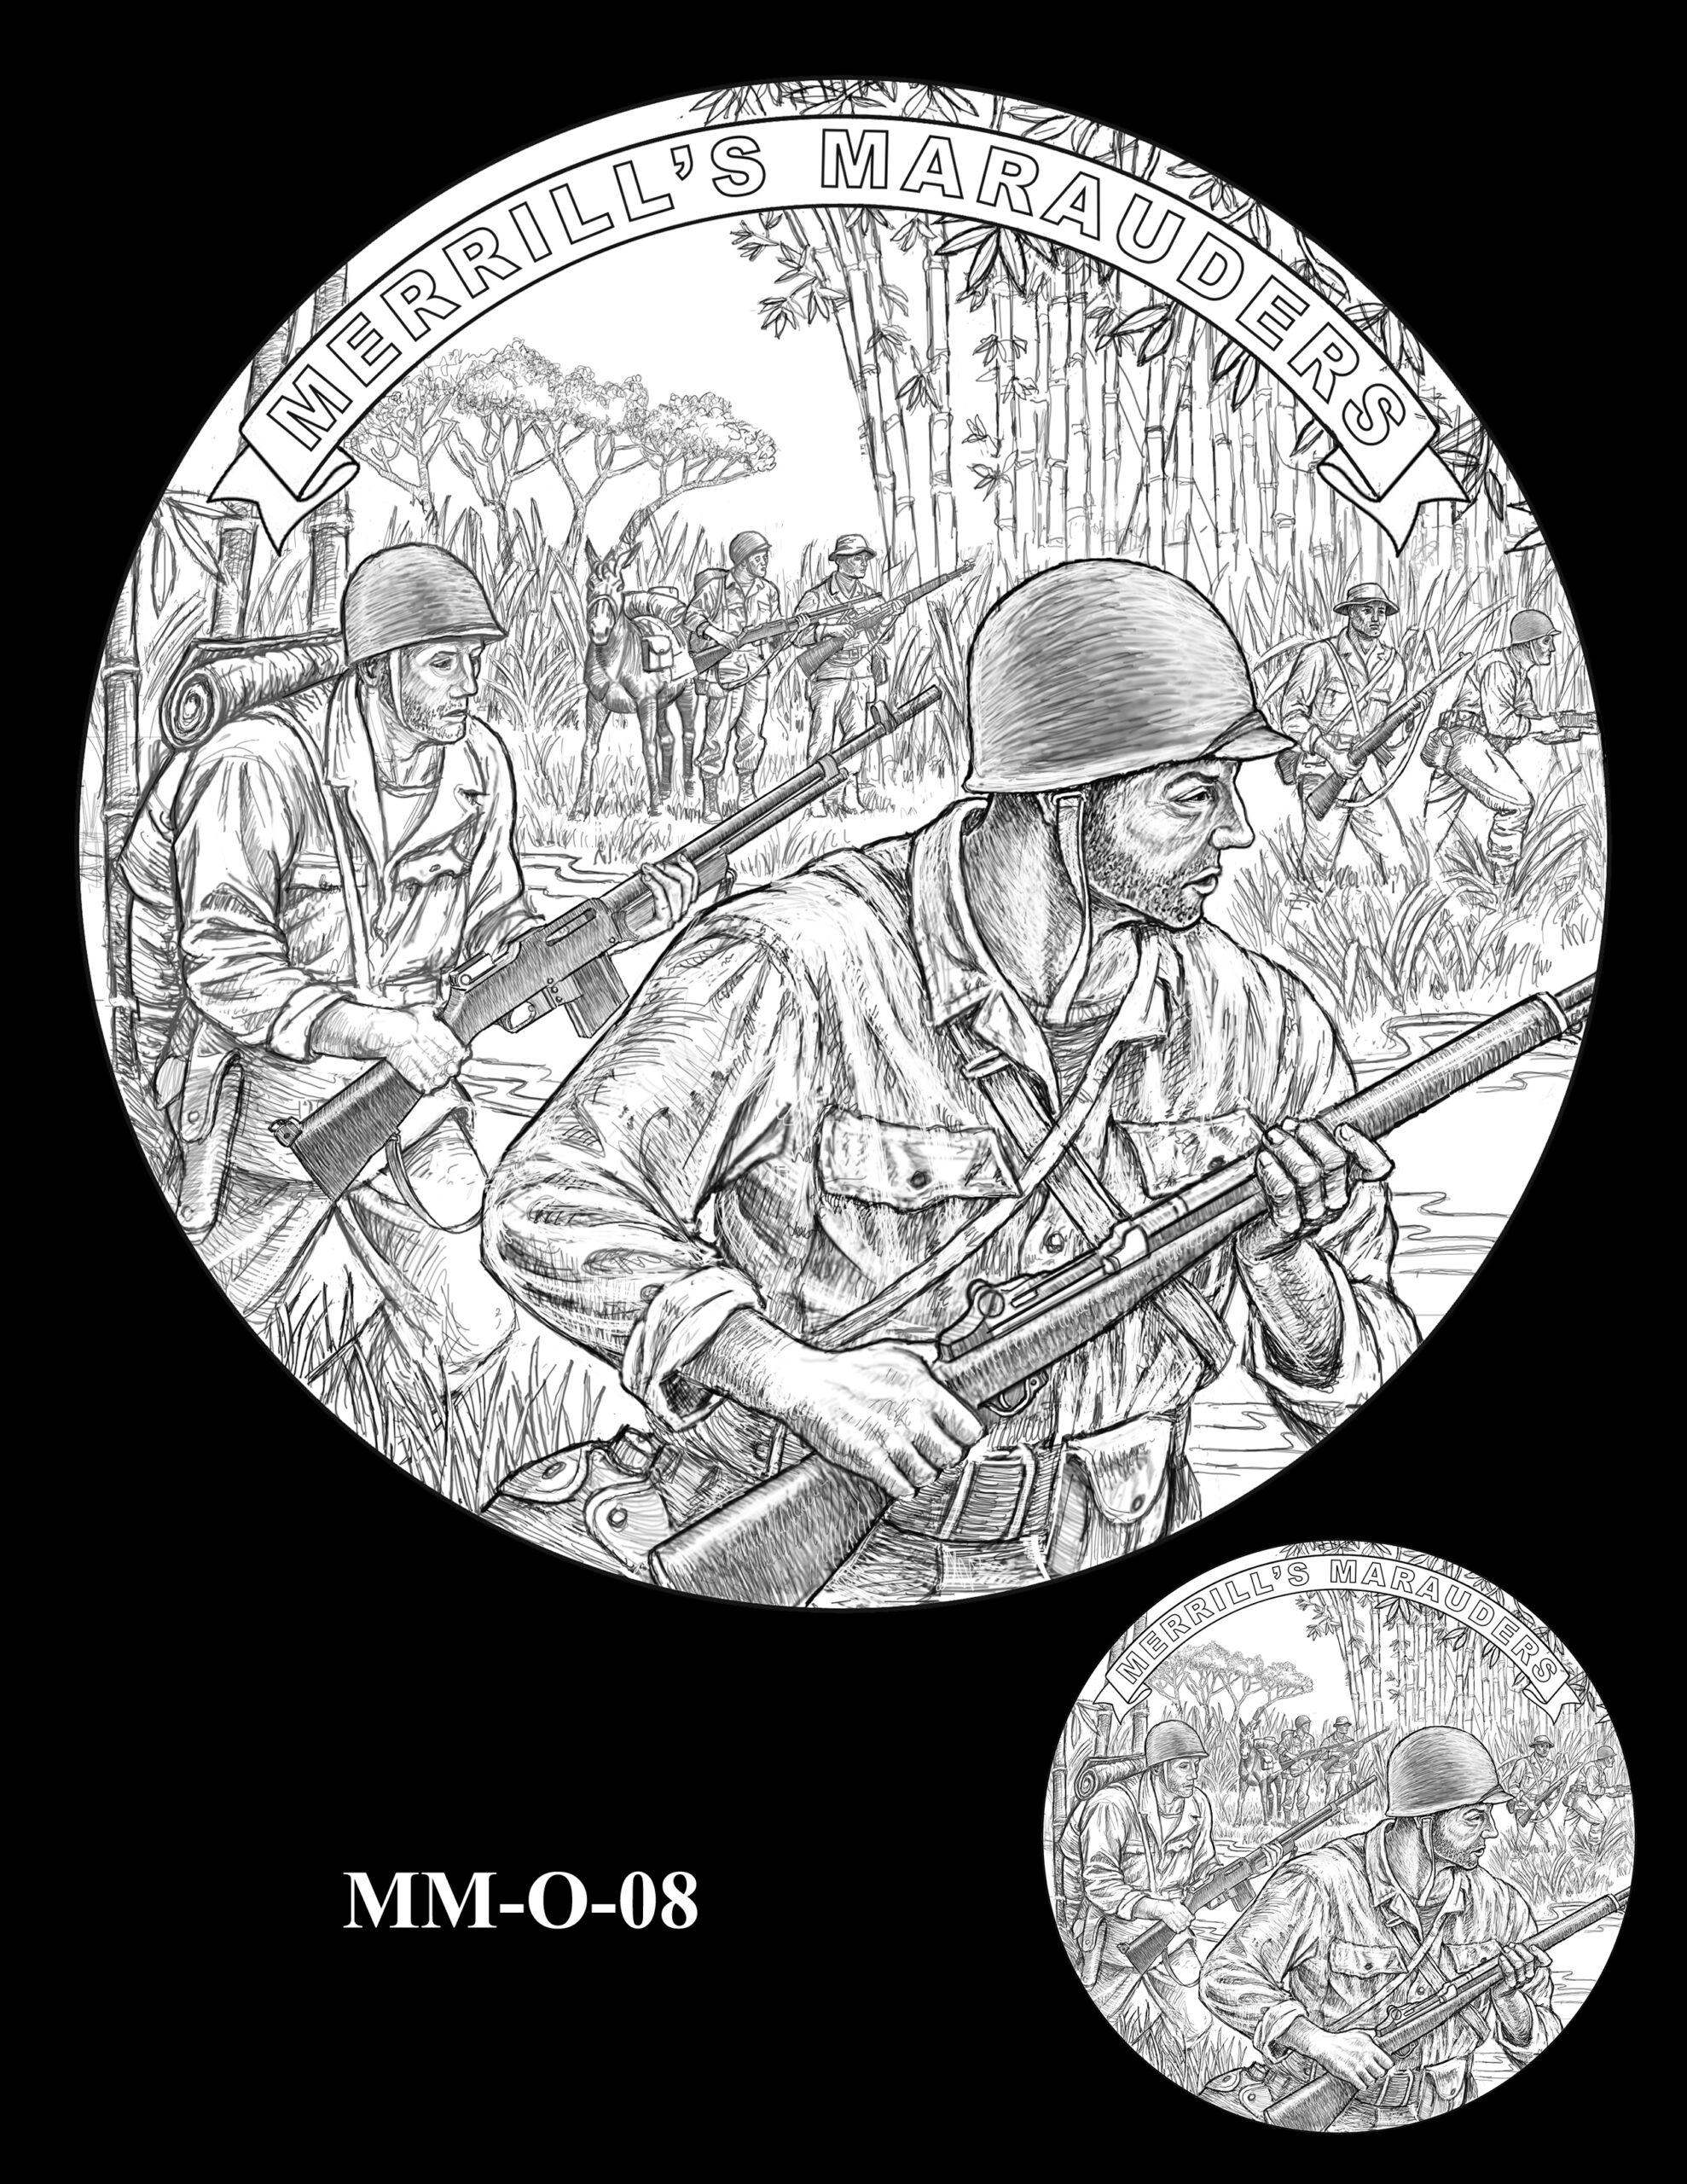 MM-O-08 -- Merrill's Marauders Congressional Gold Medal